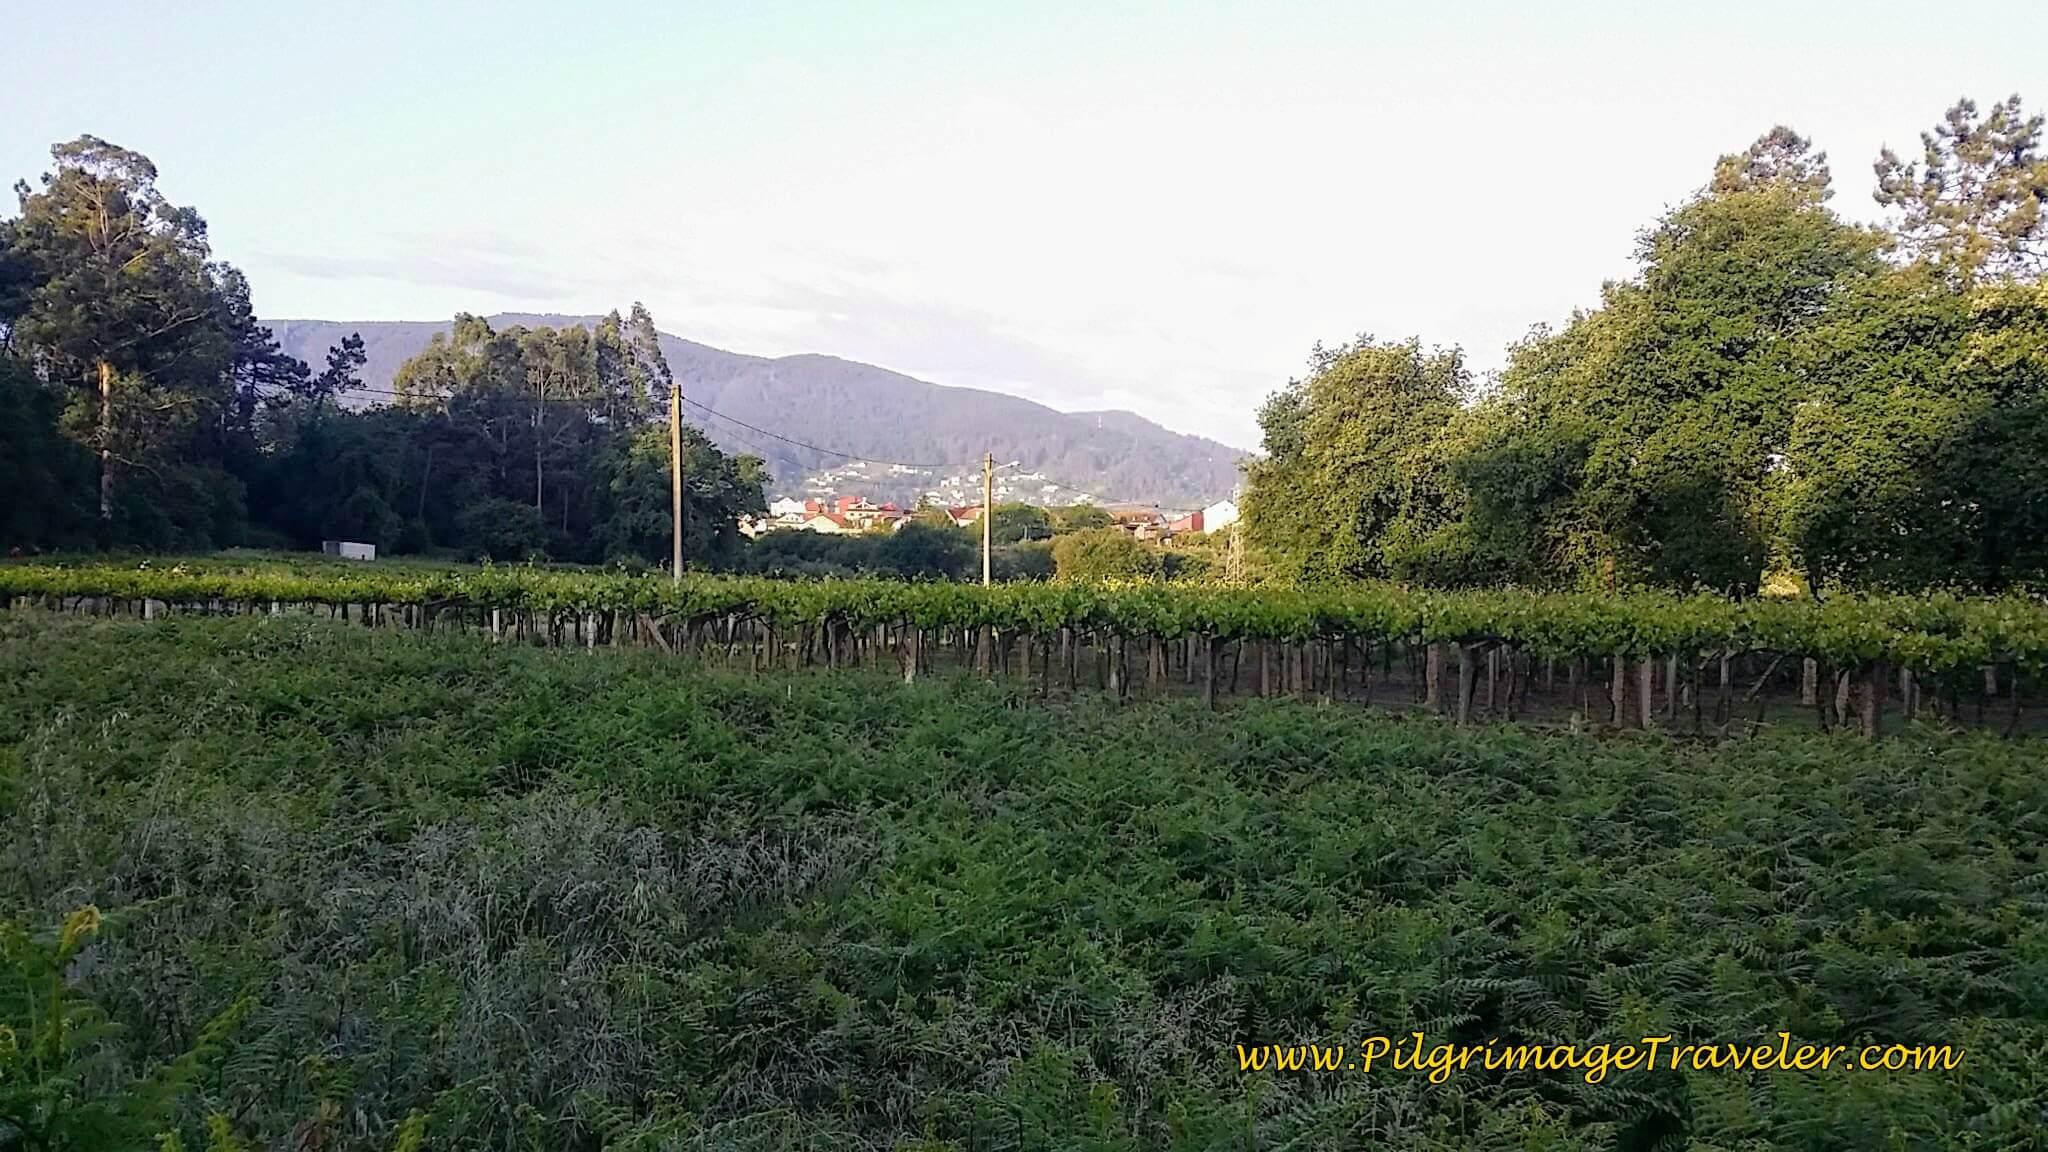 Bountiful and Plentiful Vineyards, day twenty-two on the Camino Portugués